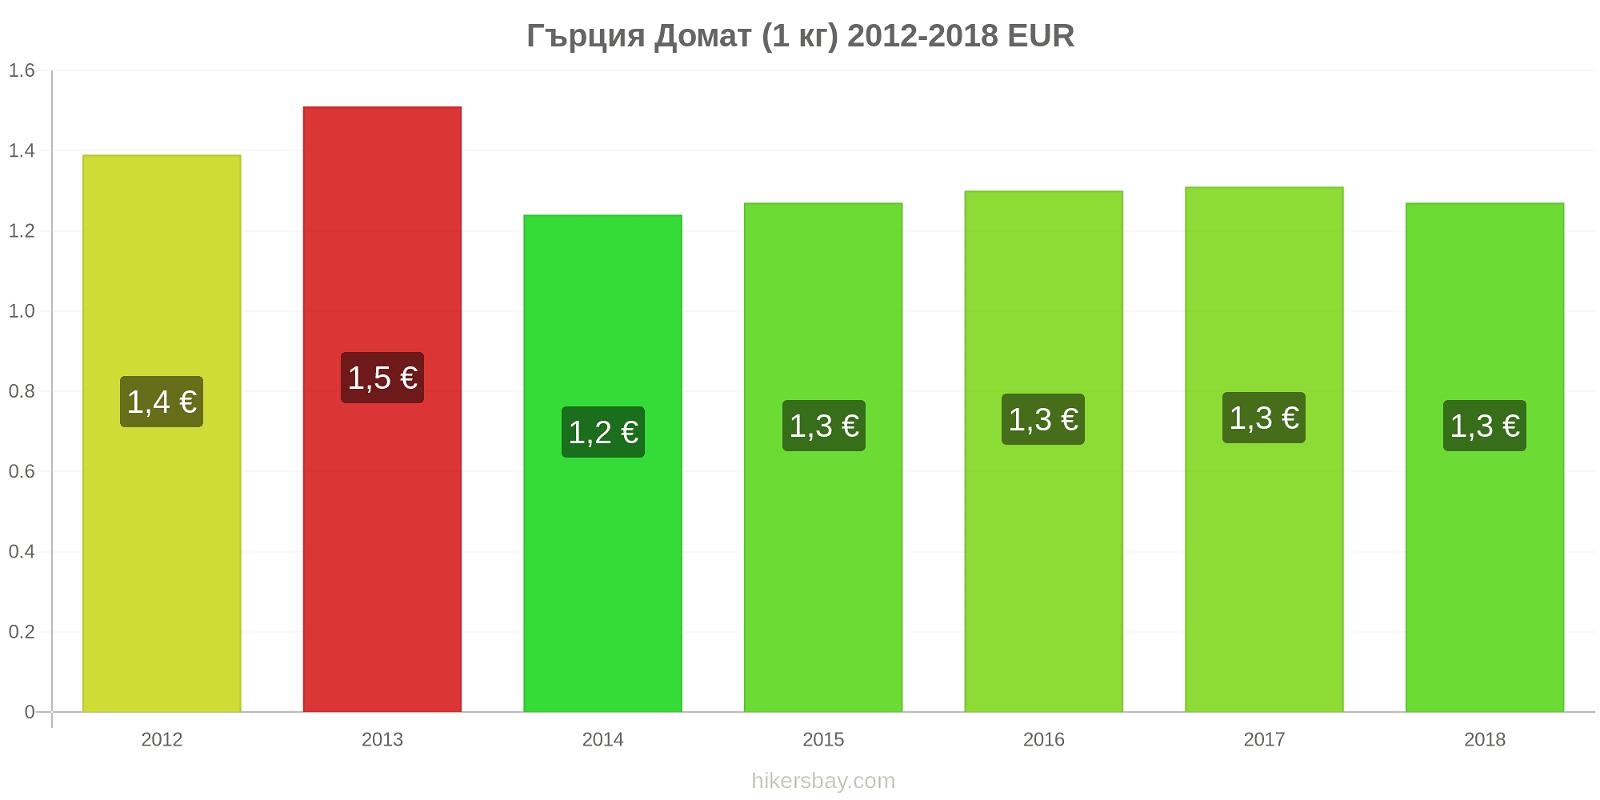 Гърция ценови промени Домат (1 кг) hikersbay.com